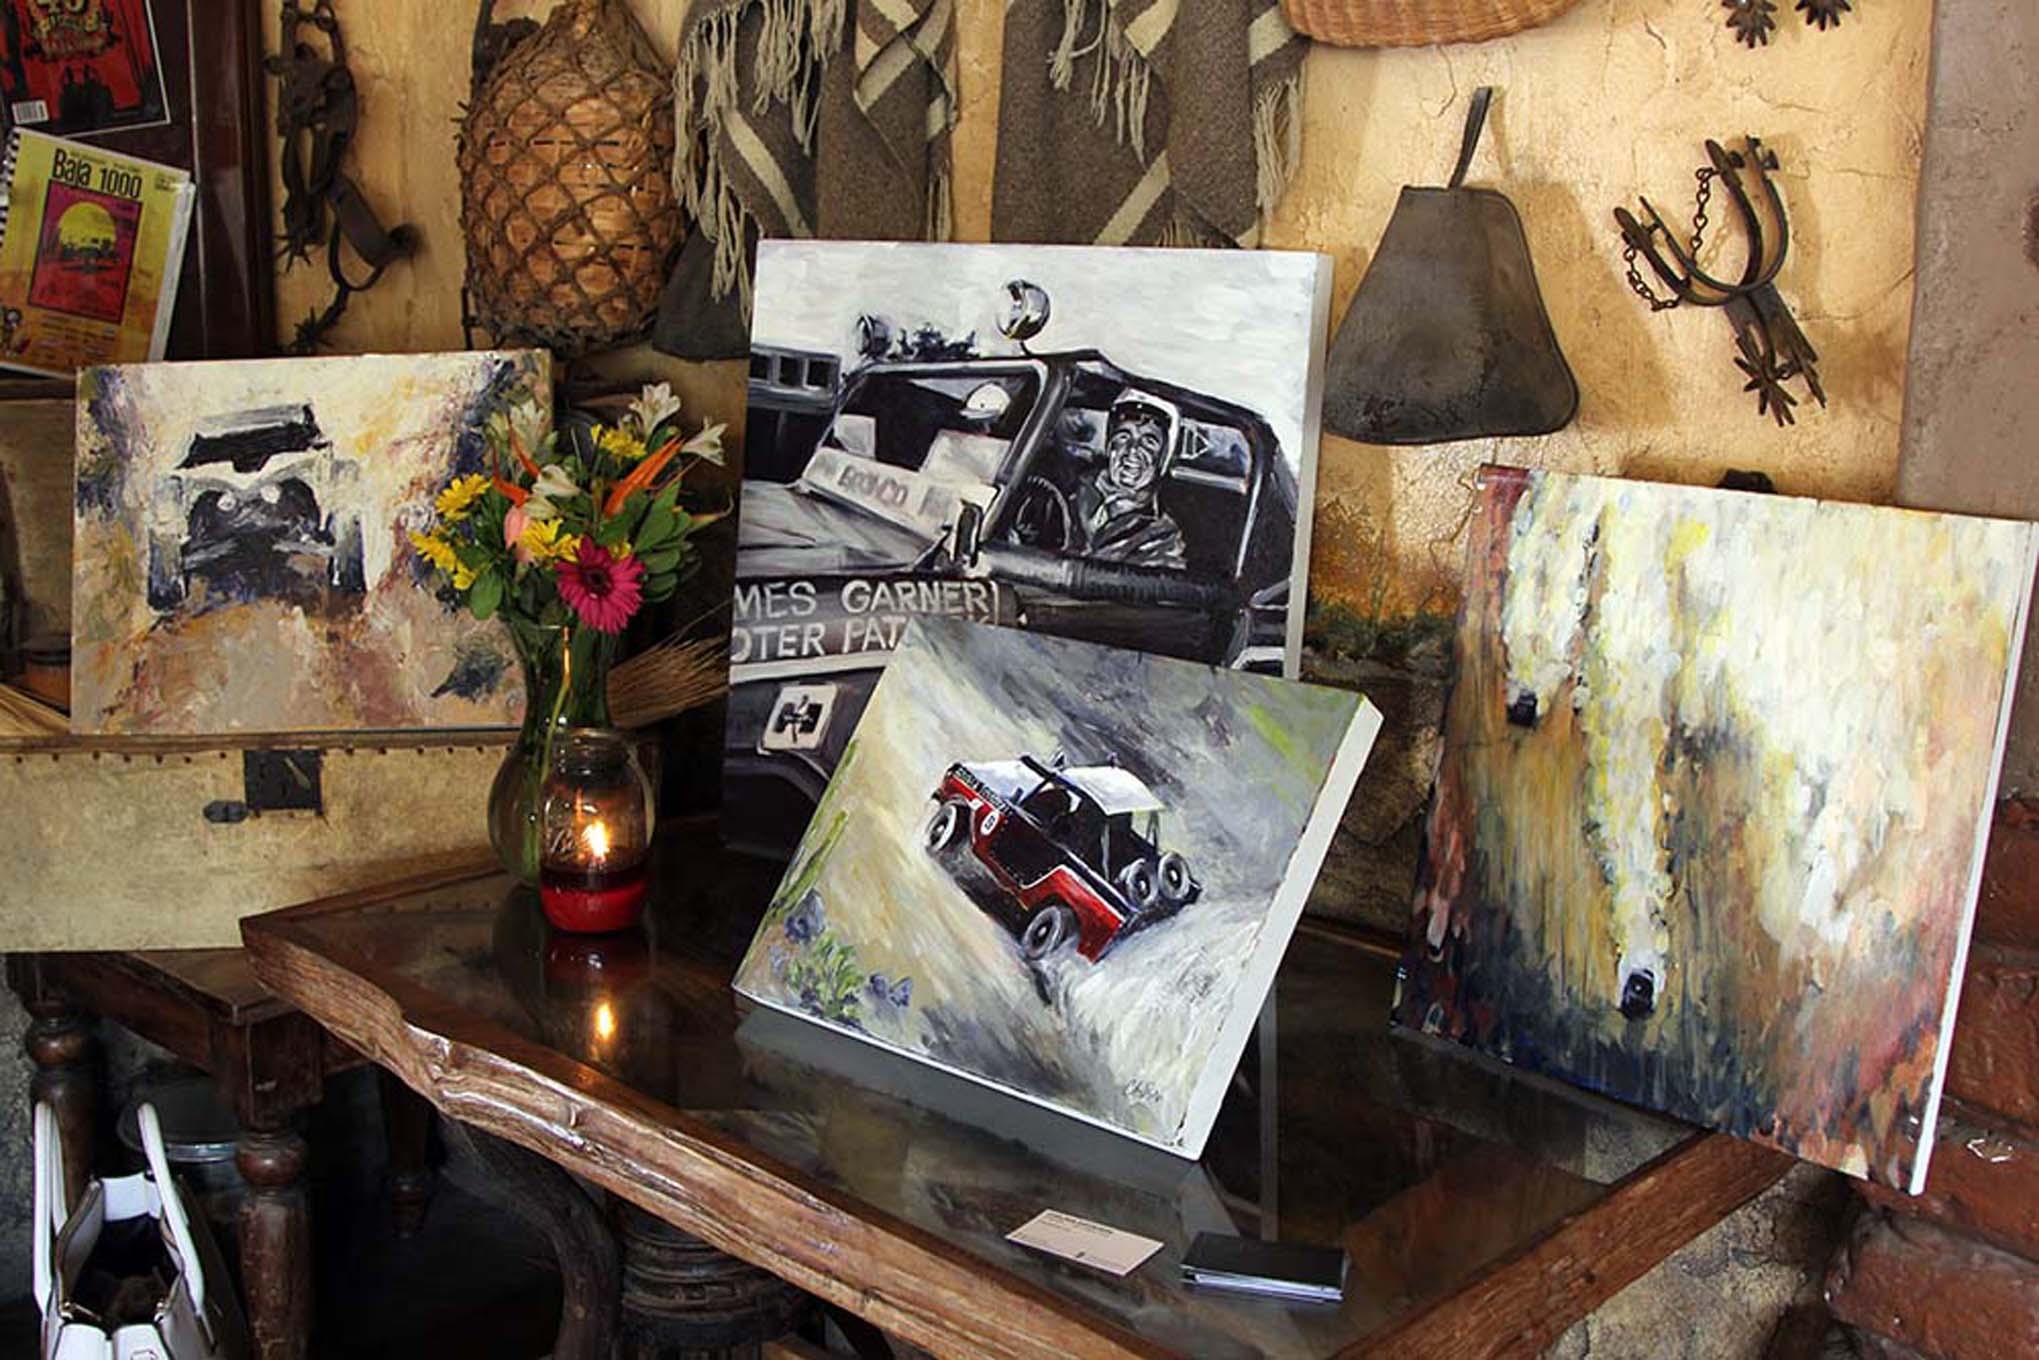 036NORRA Mexican 1000 BAJA offroad Race 2015 Manx Nova Chevy James Garner